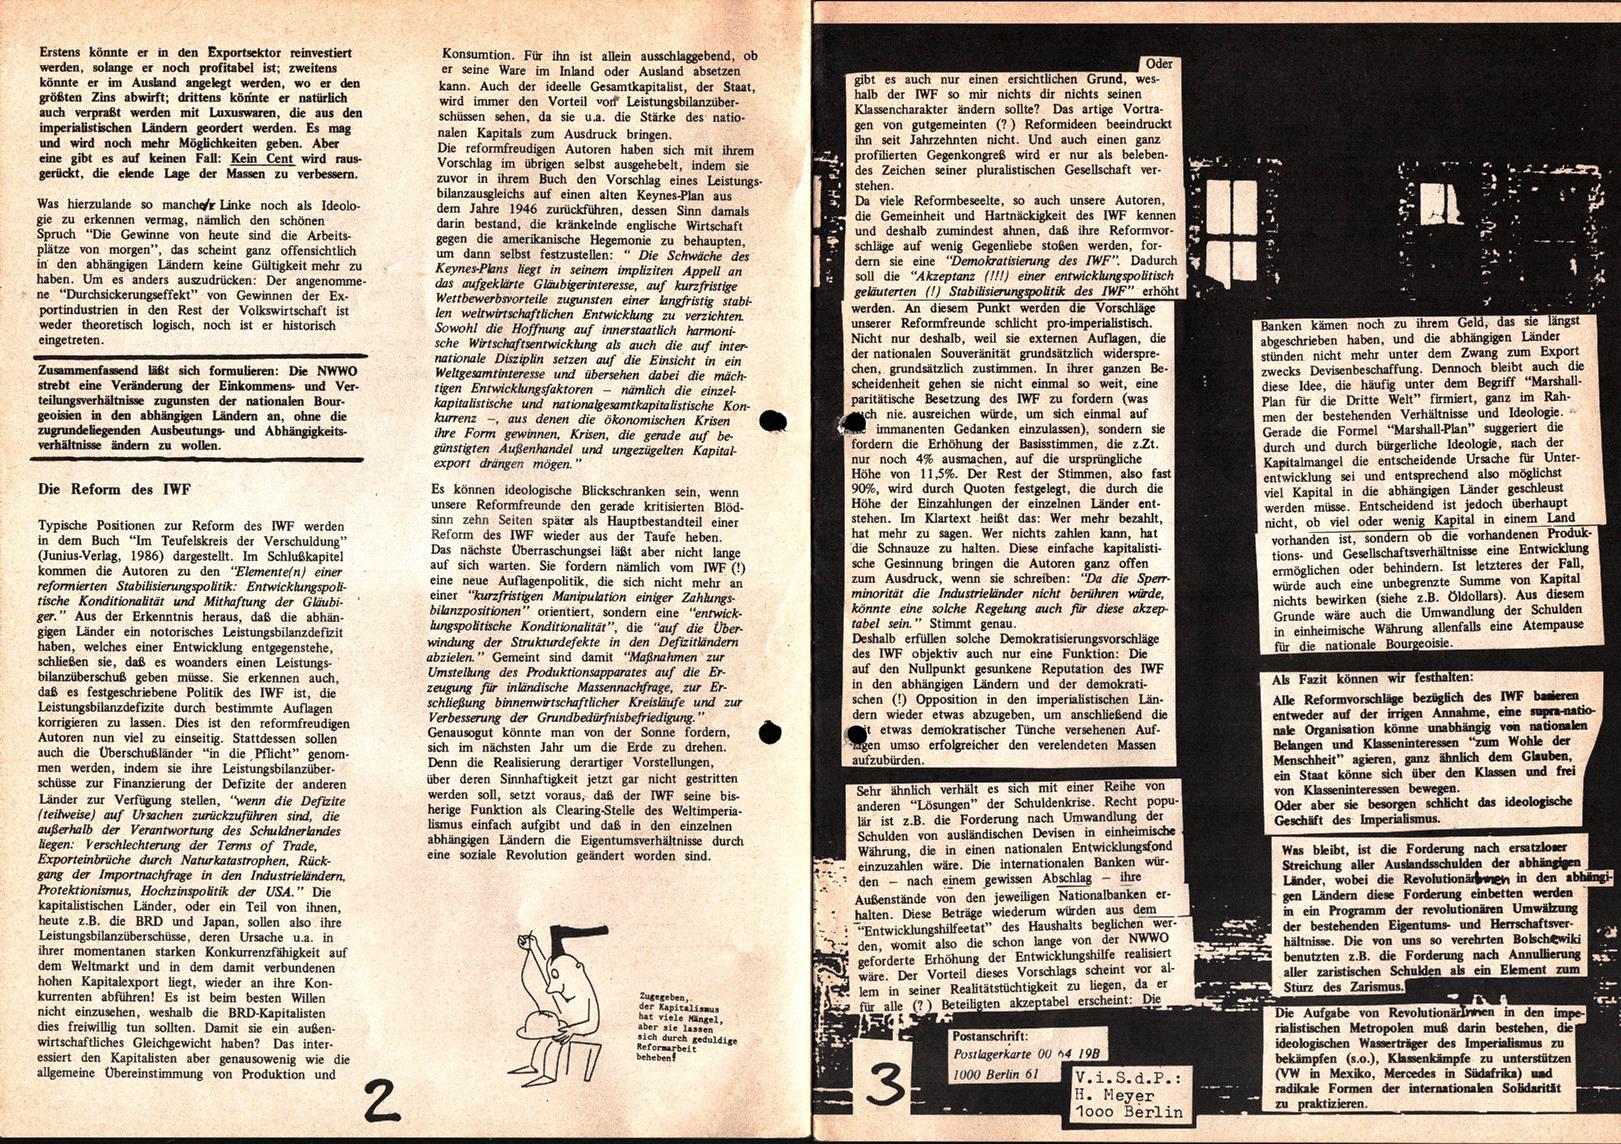 BER_IKW_Oktober_19871100_022_002